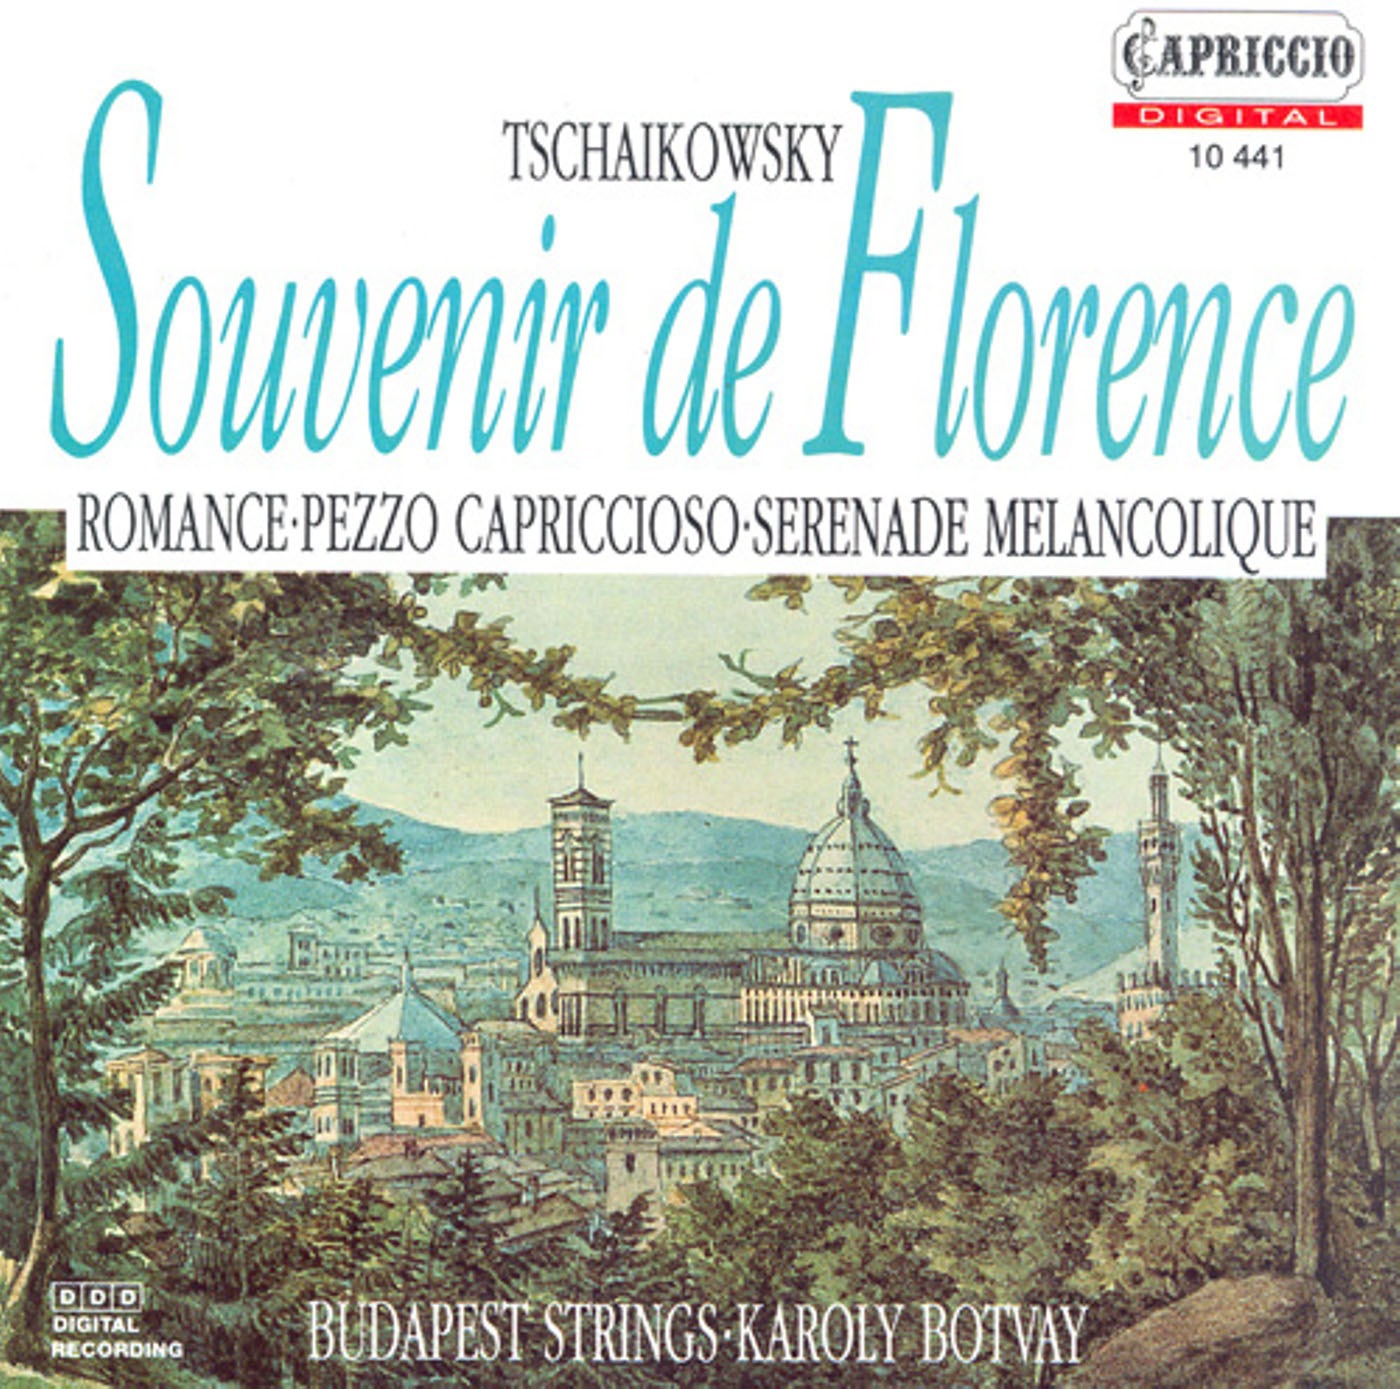 Tchaikovsky, P.I.: Souvenir De Florence - Valse-Scherzo - Serenade Melancolique - Pezzo Capriccioso - Romance